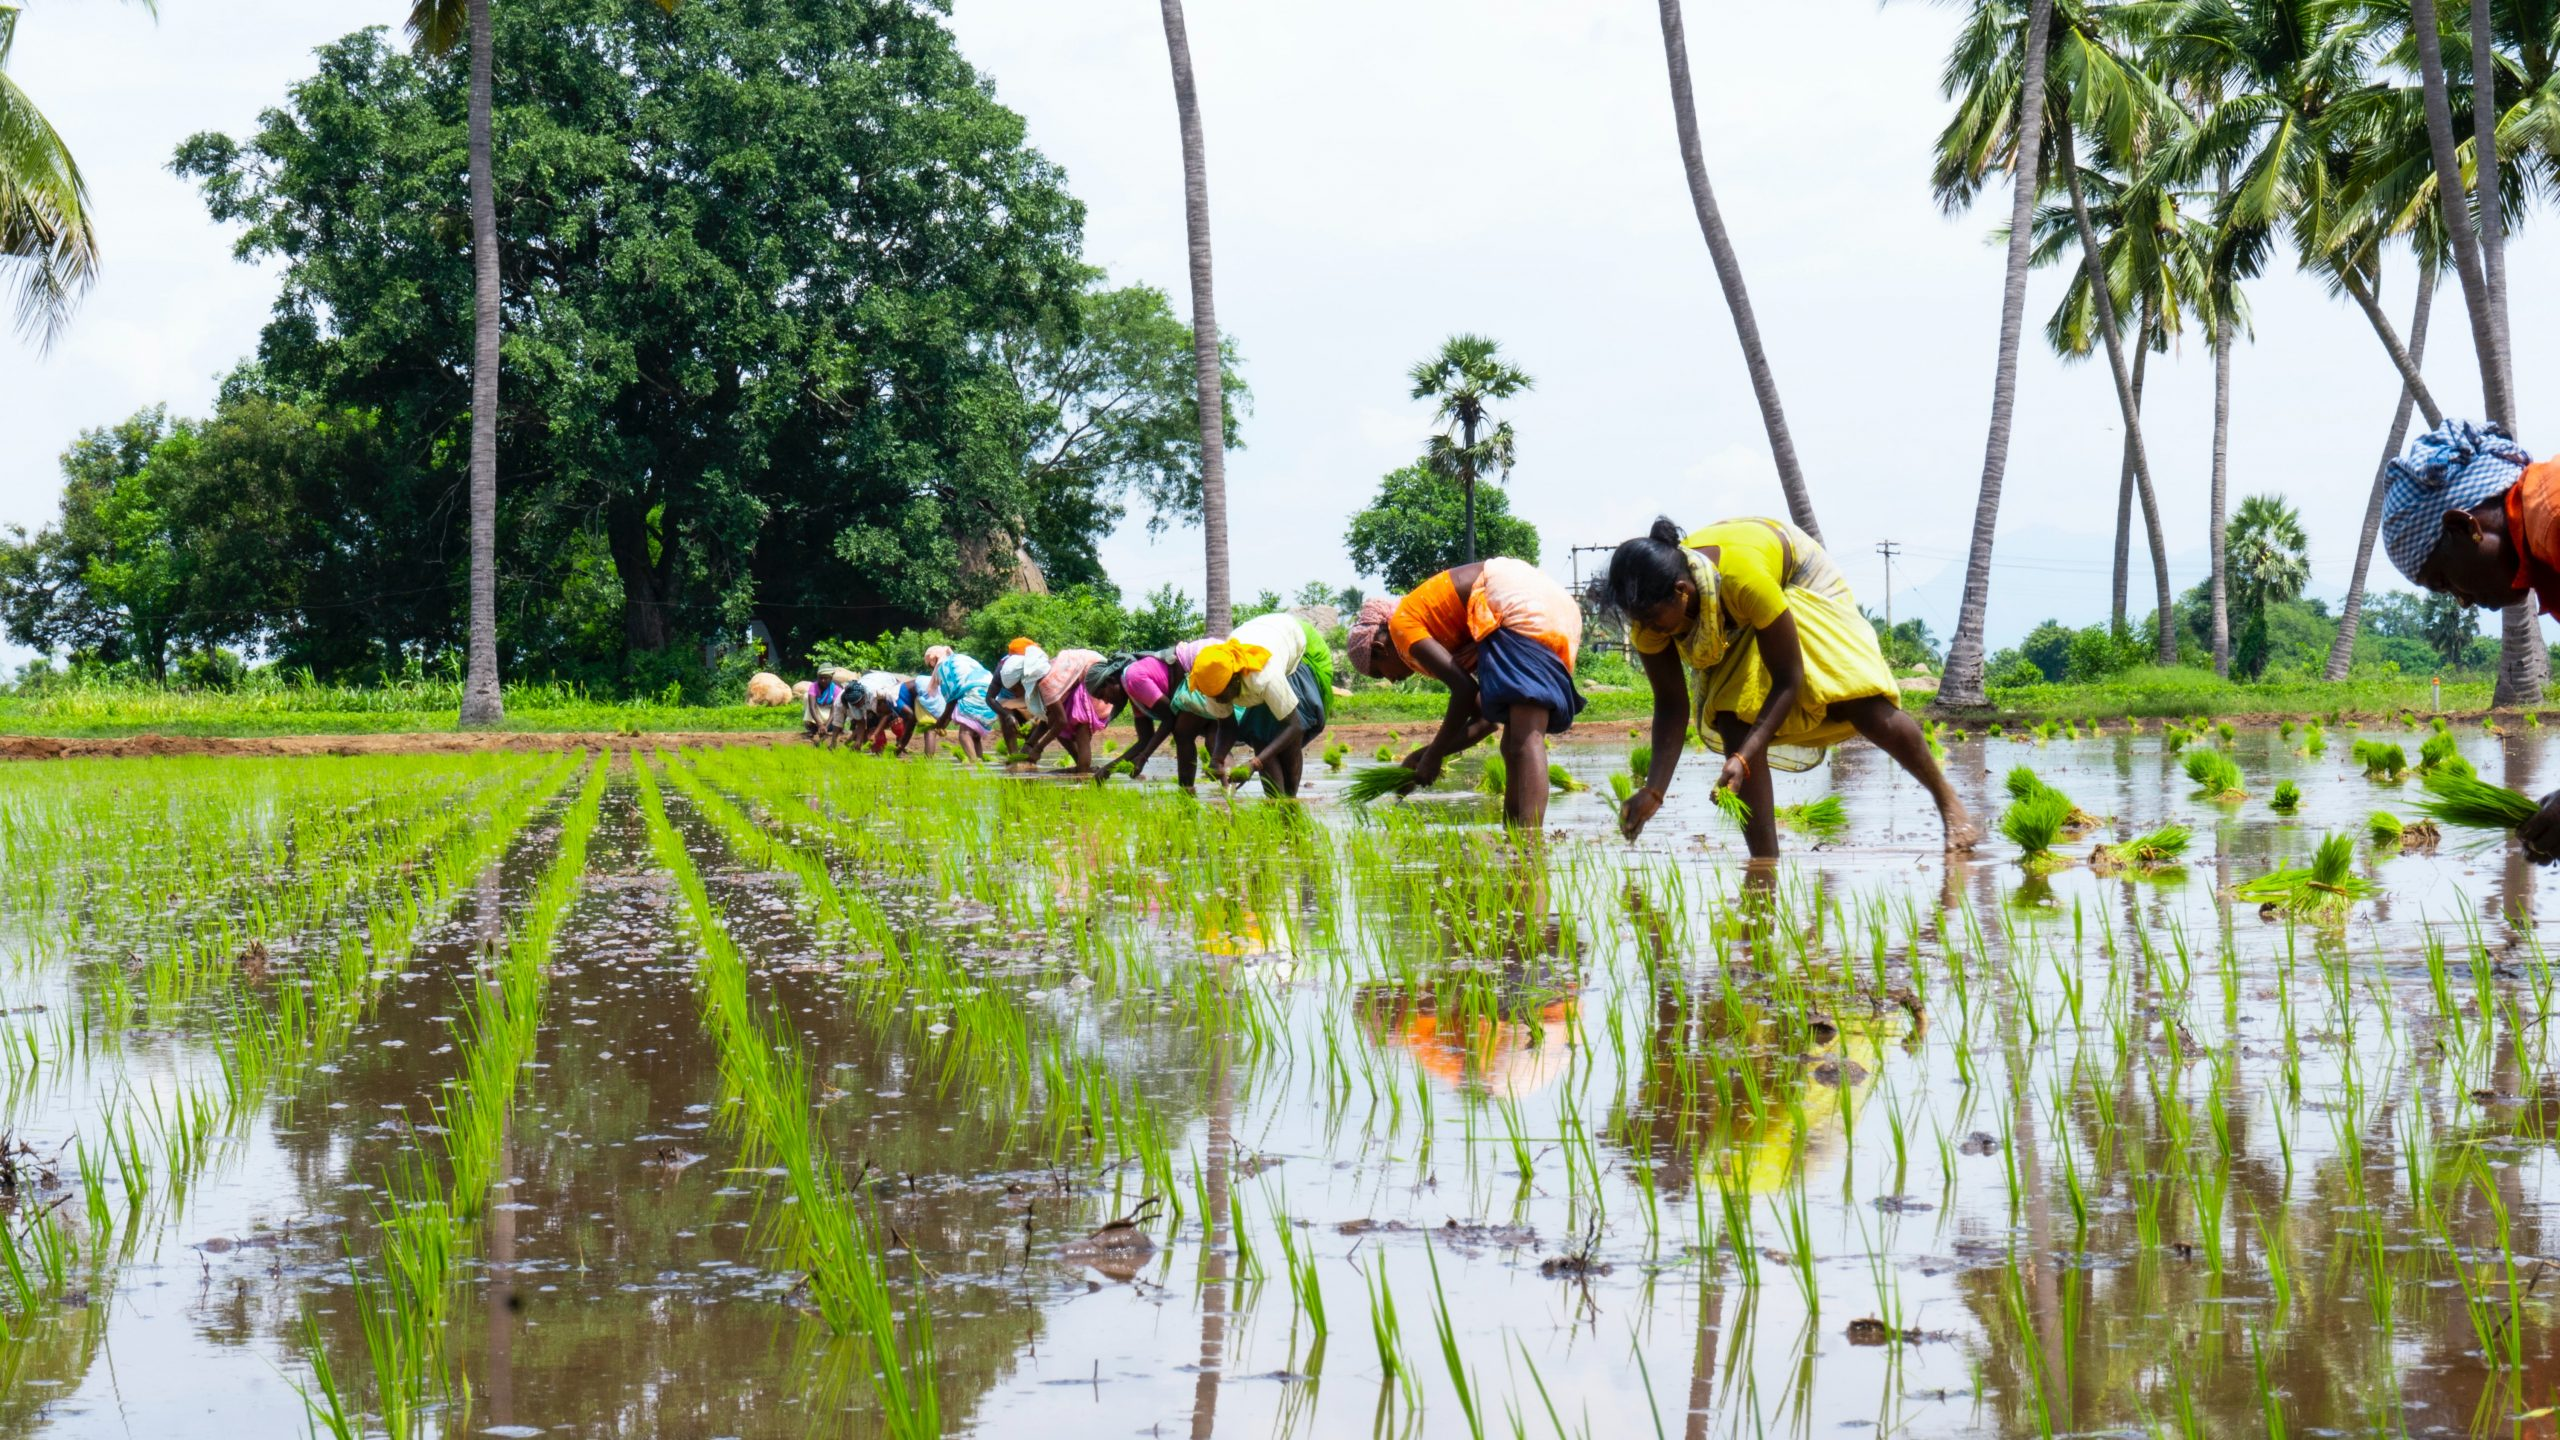 rice field in Tamil Nadu